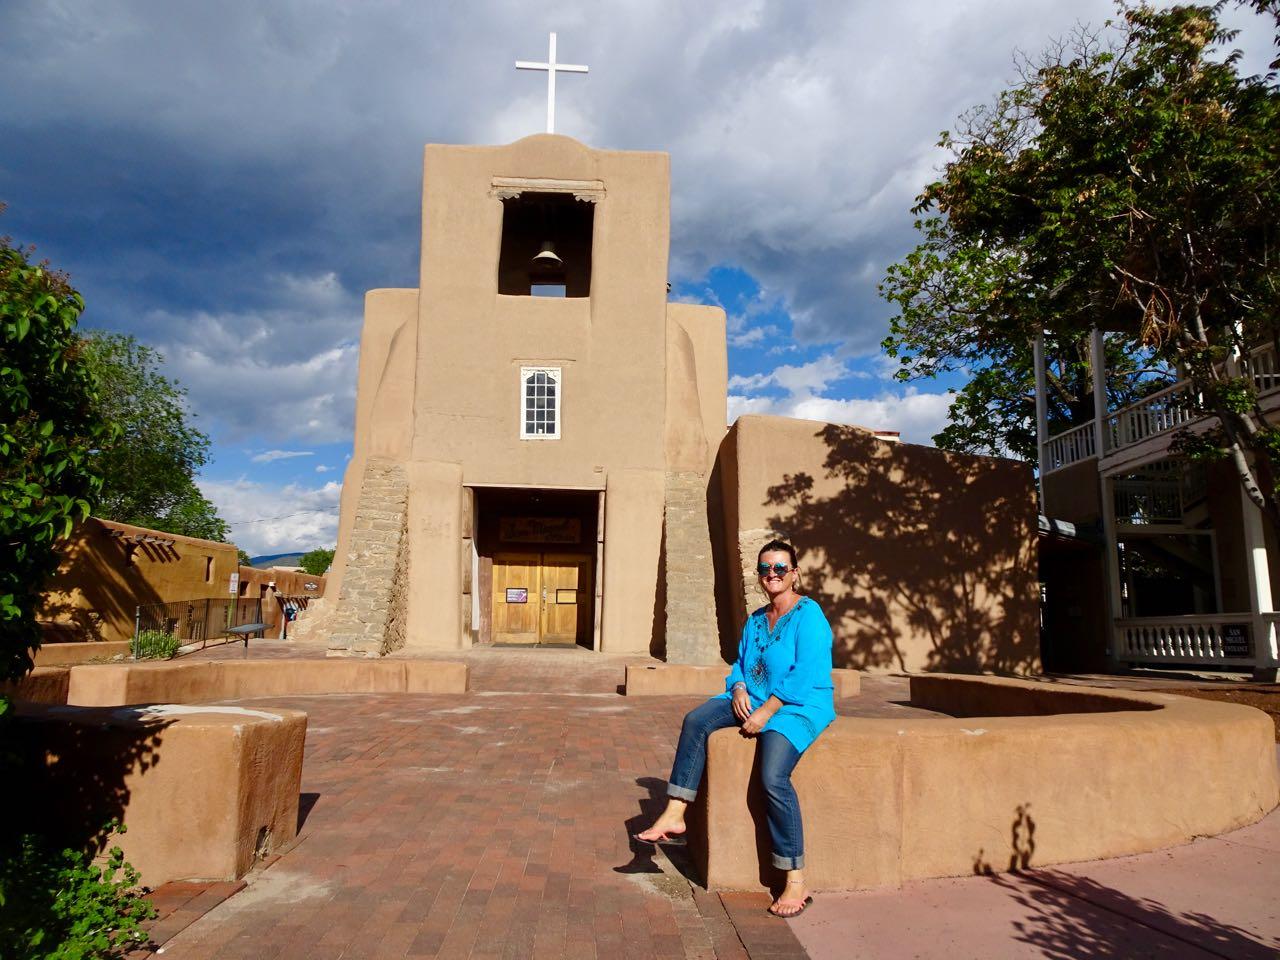 Älteste Kirche der USA 1610